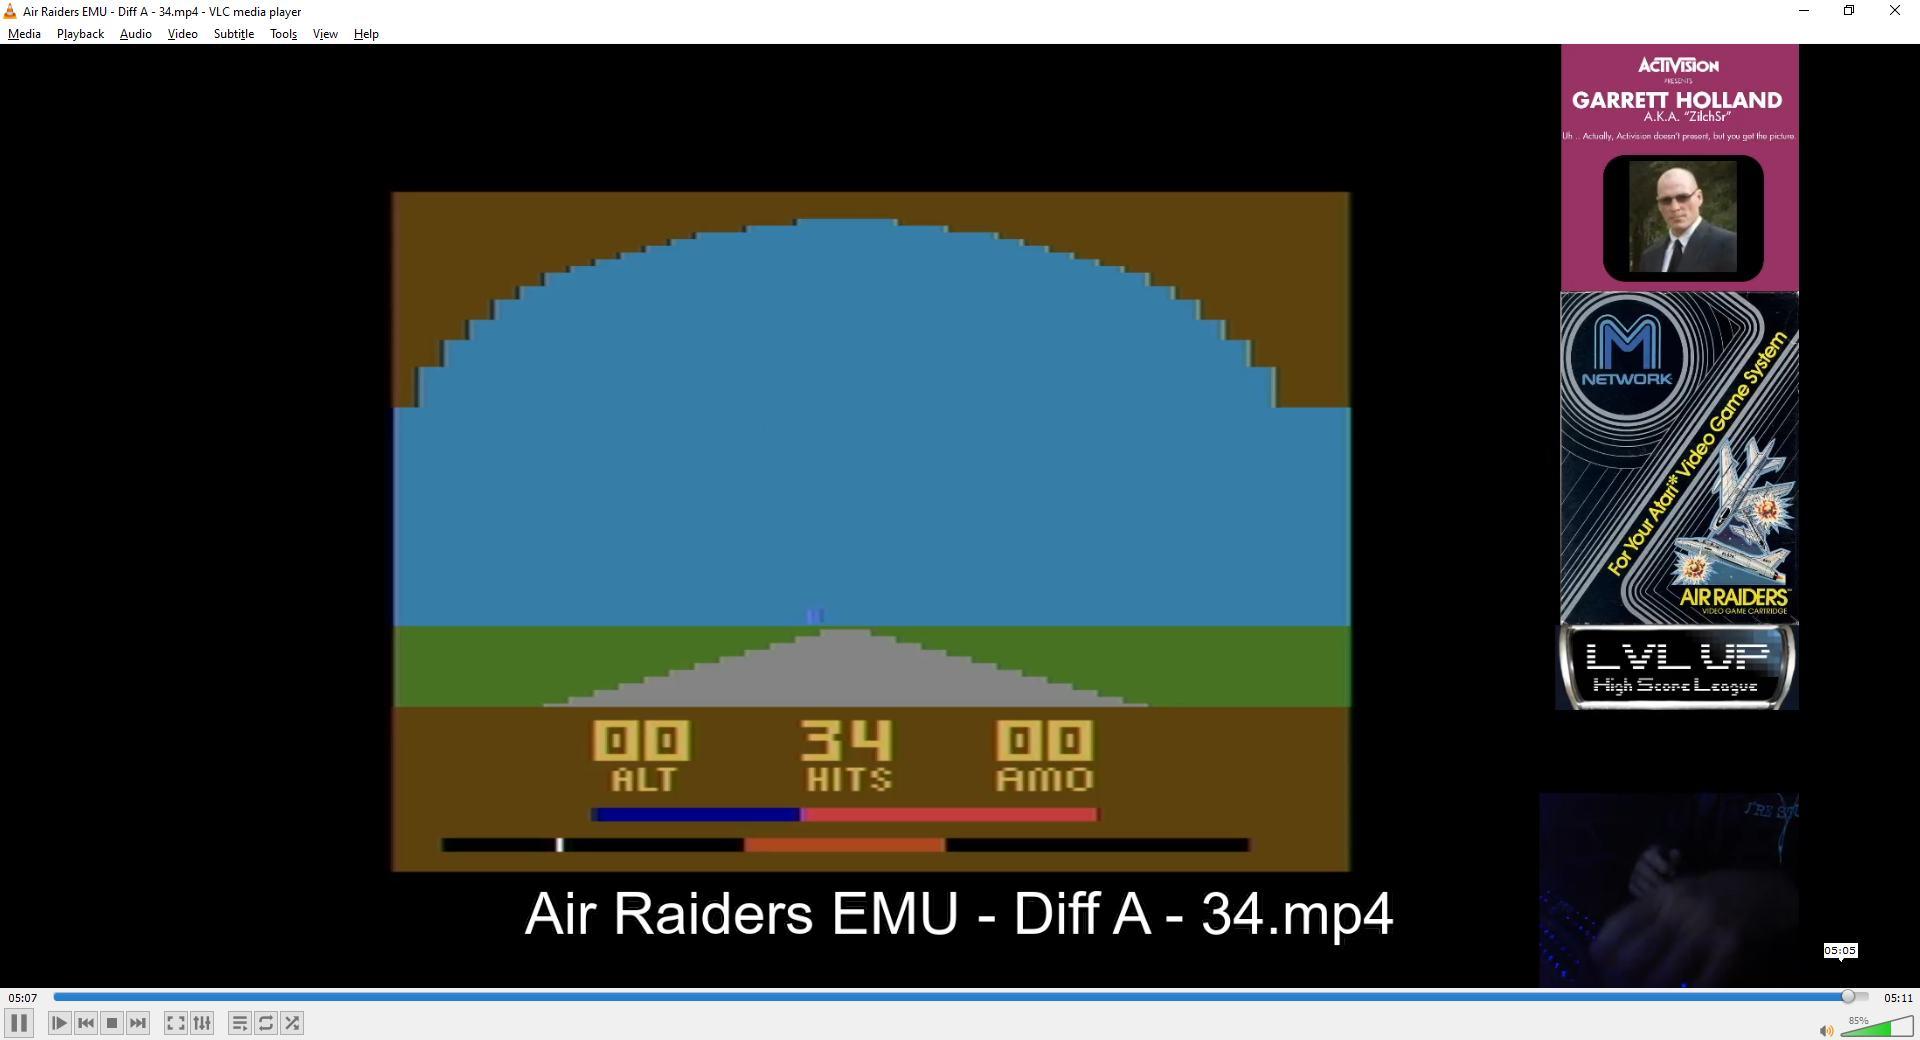 ZilchSr: Air Raiders (Atari 2600 Emulated Expert/A Mode) 34 points on 2021-02-13 16:16:18